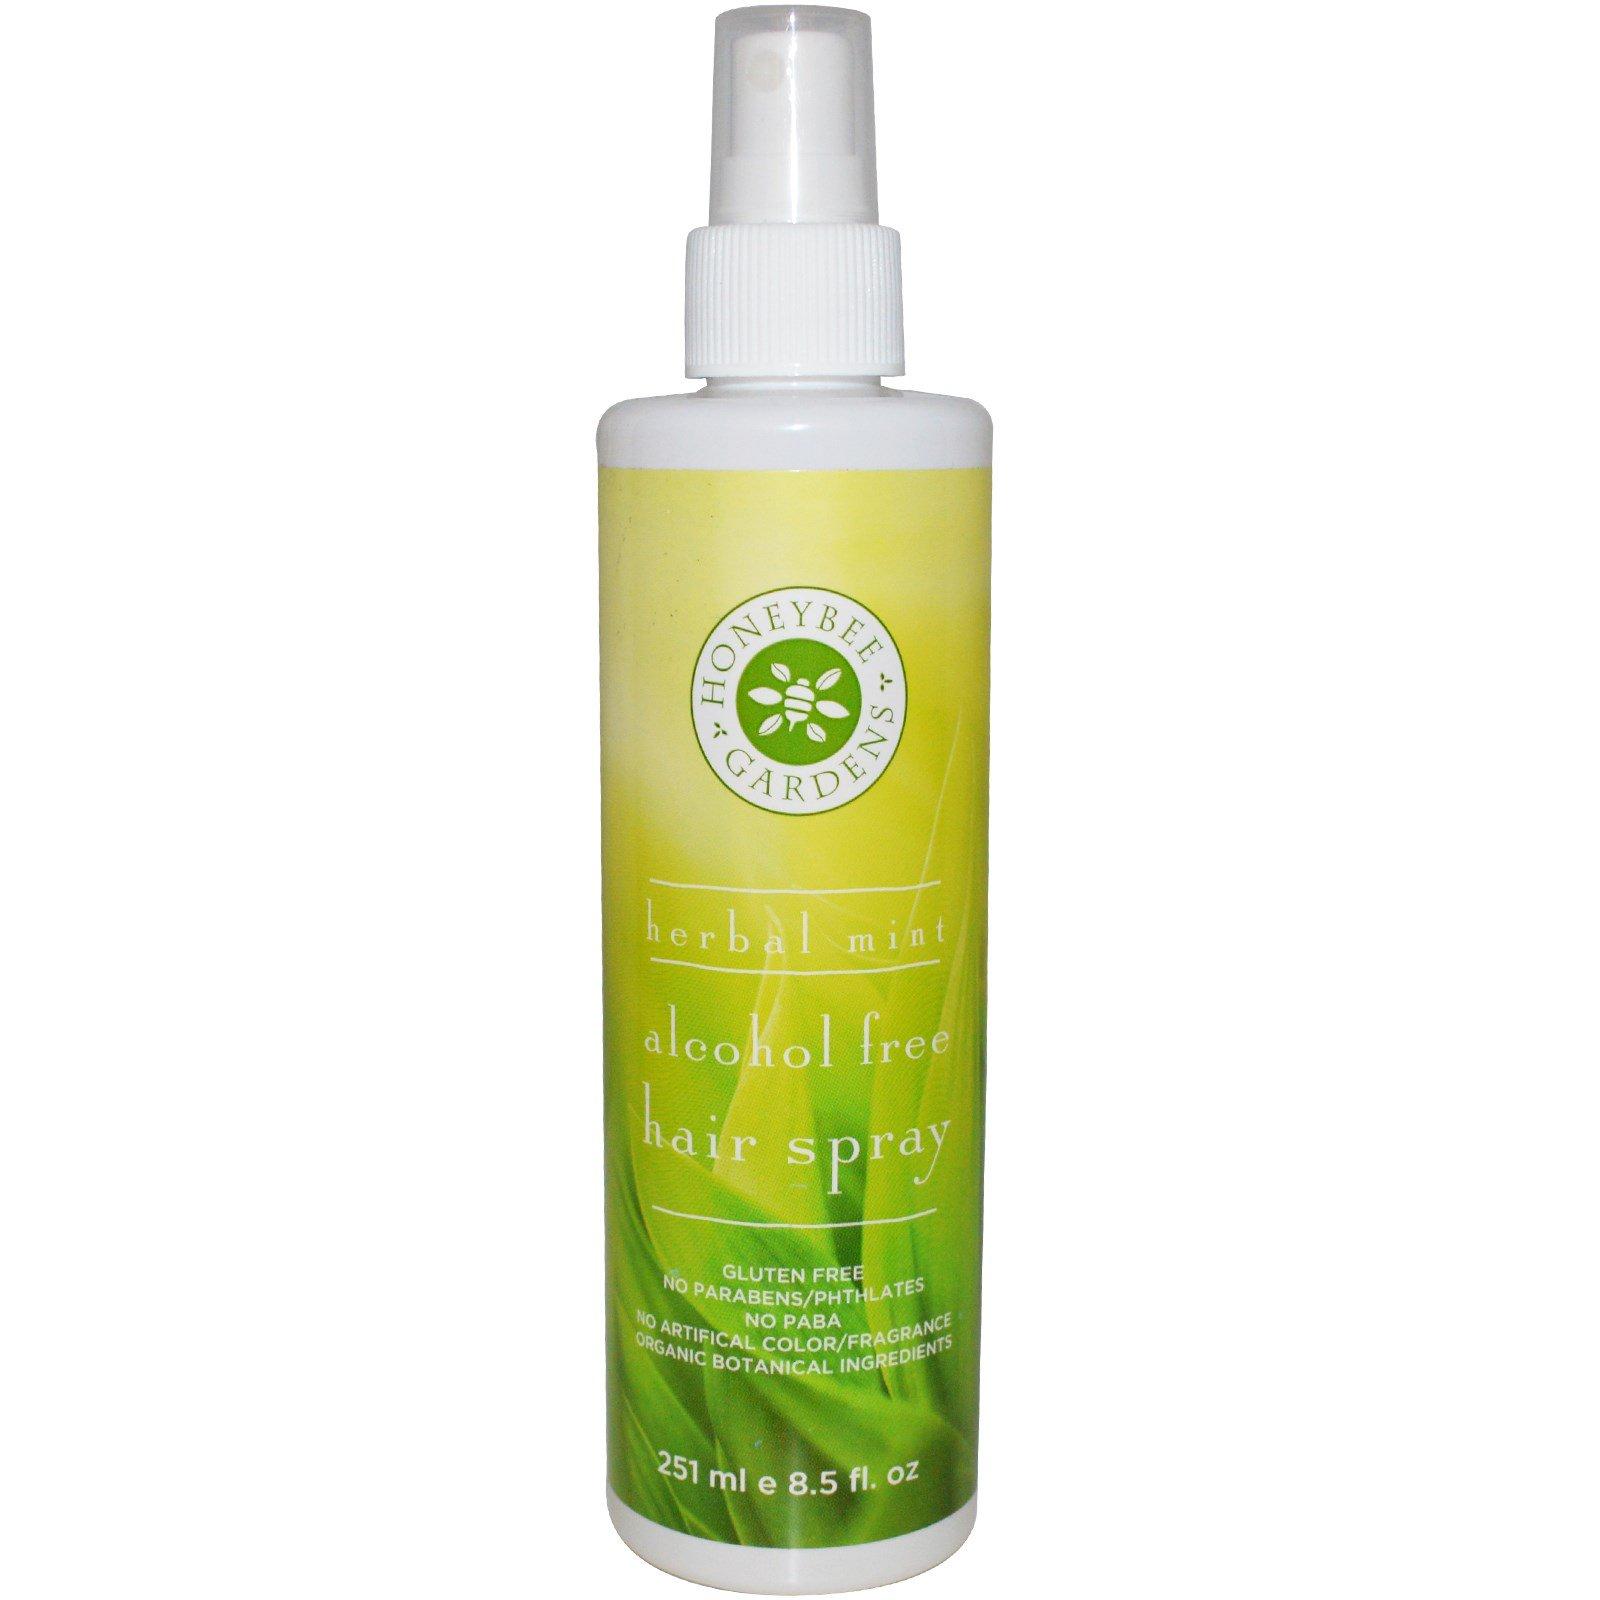 Honeybee Gardens, Спрей для волос без спирта с травяным ароматом мяты, 251 мл